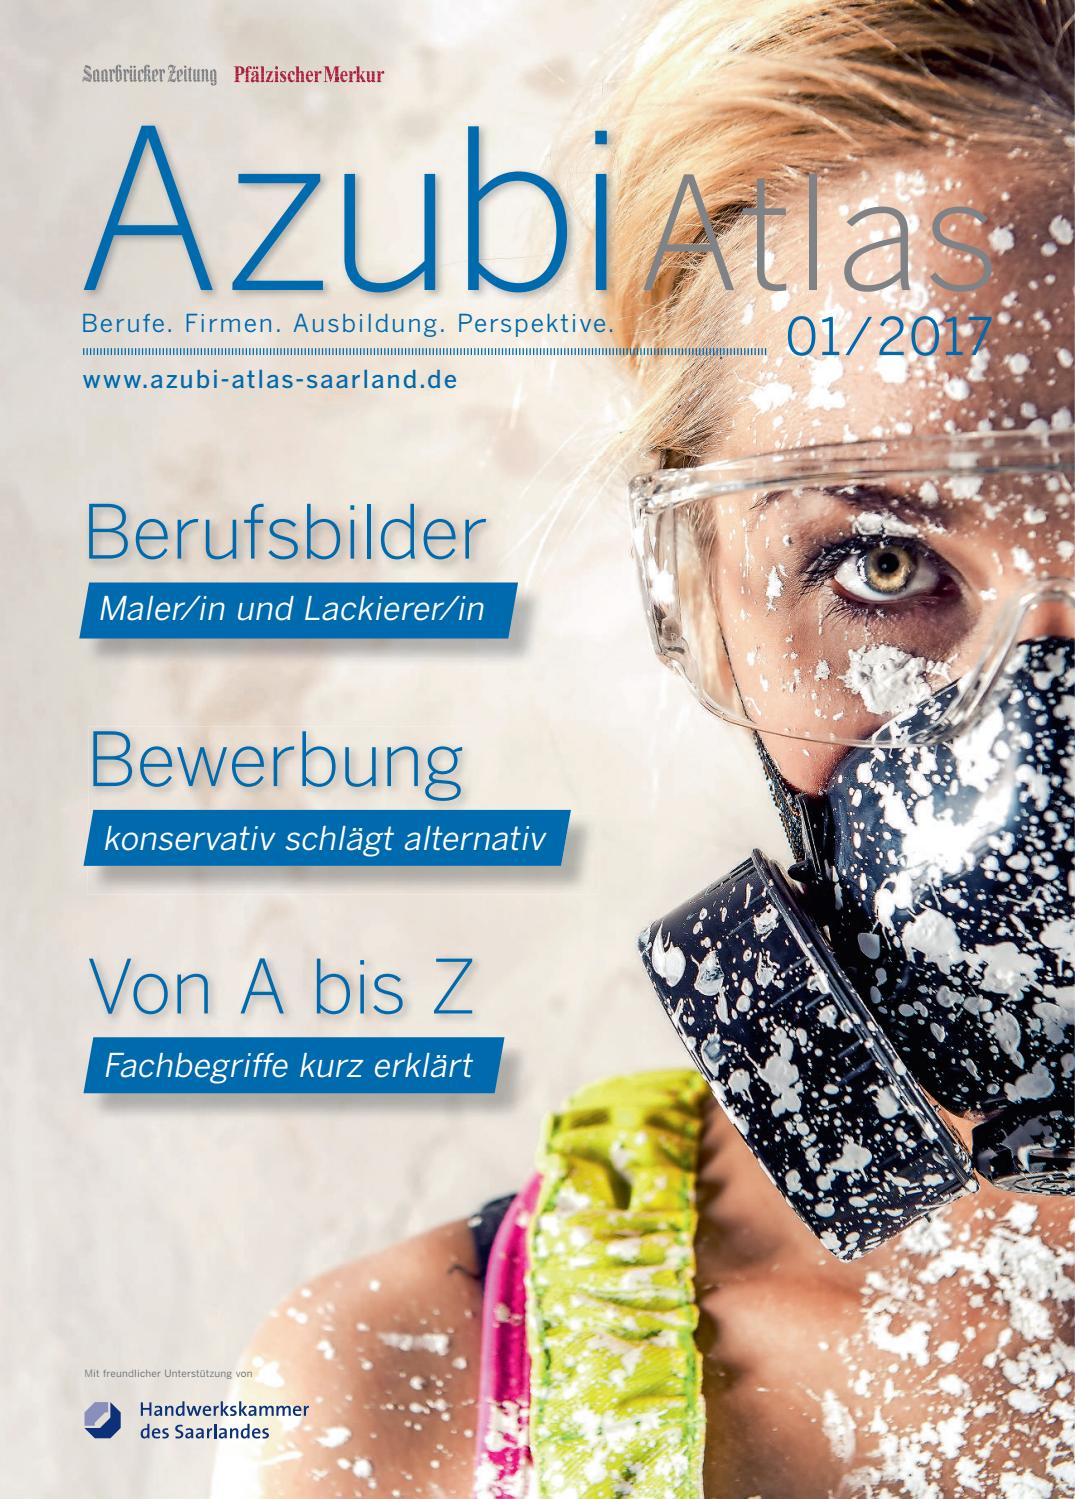 Azubi Atlas 012017 By Saarbrücker Verlagsservice Gmbh Issuu